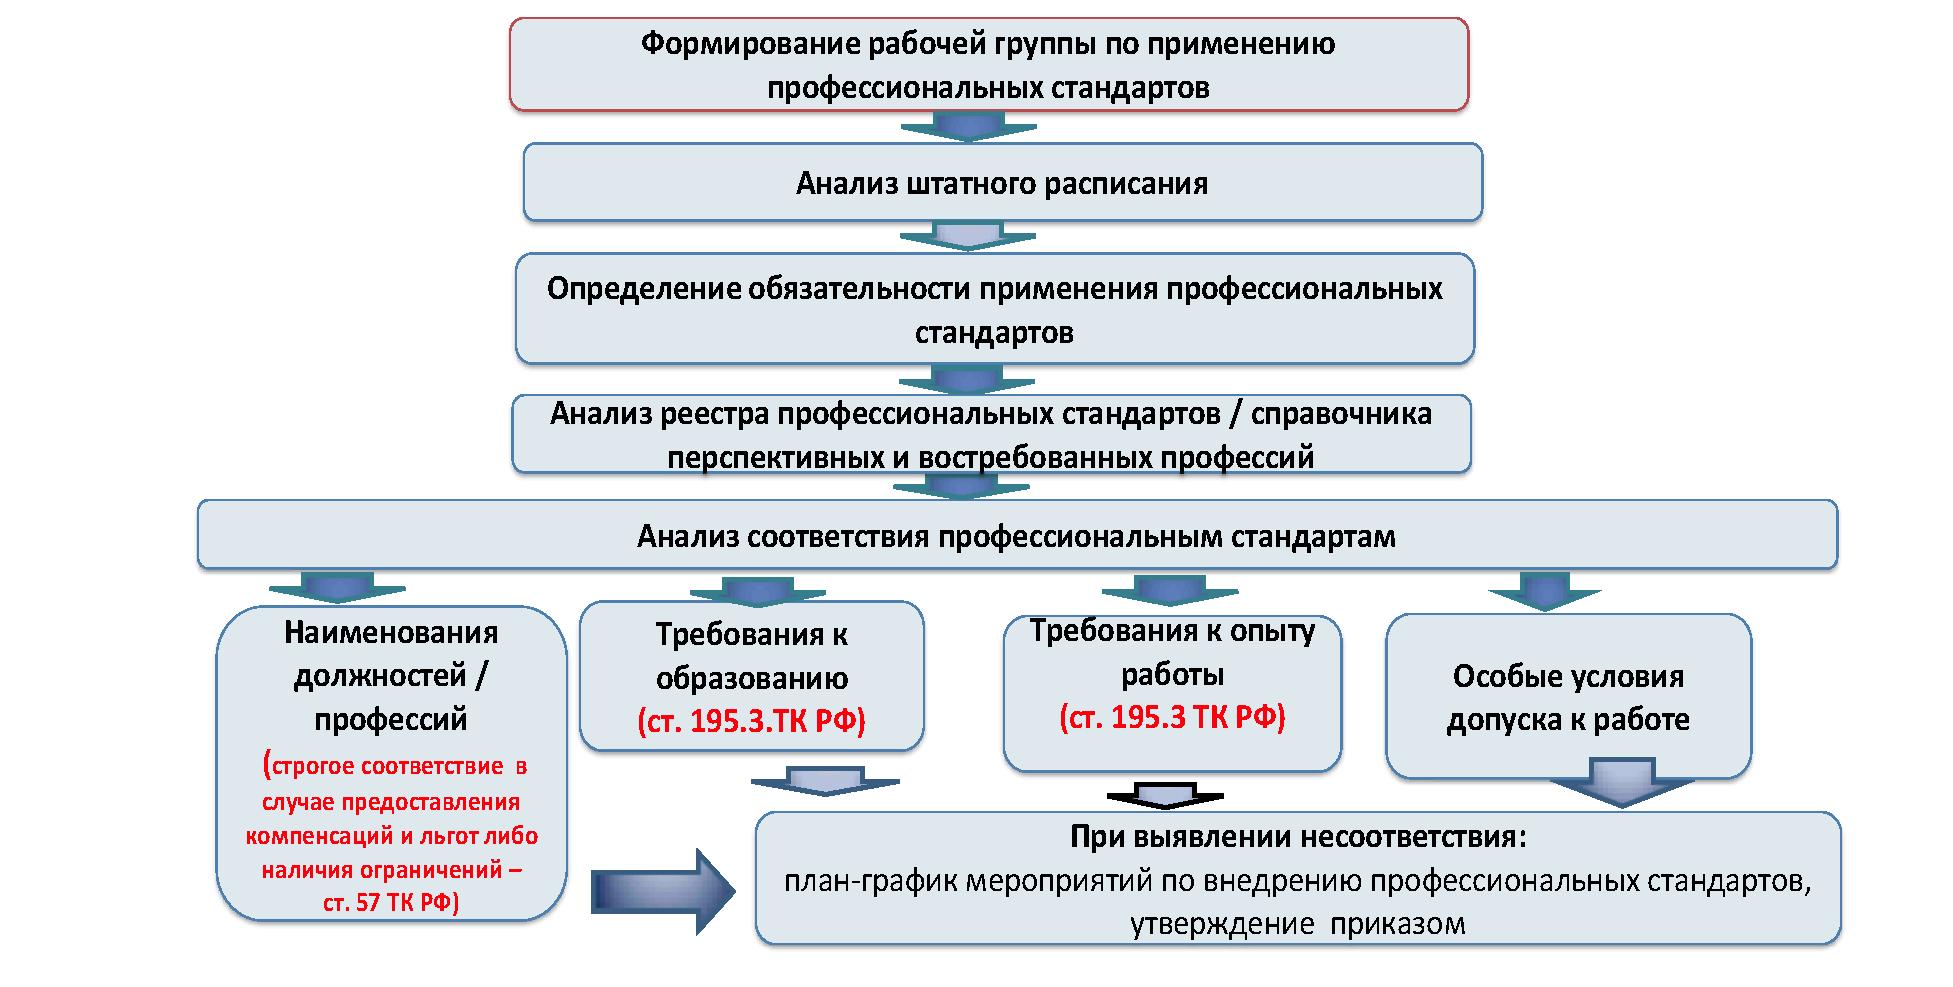 https://www.garant.ru/files/8/6/1301568/pict18-72817320.png